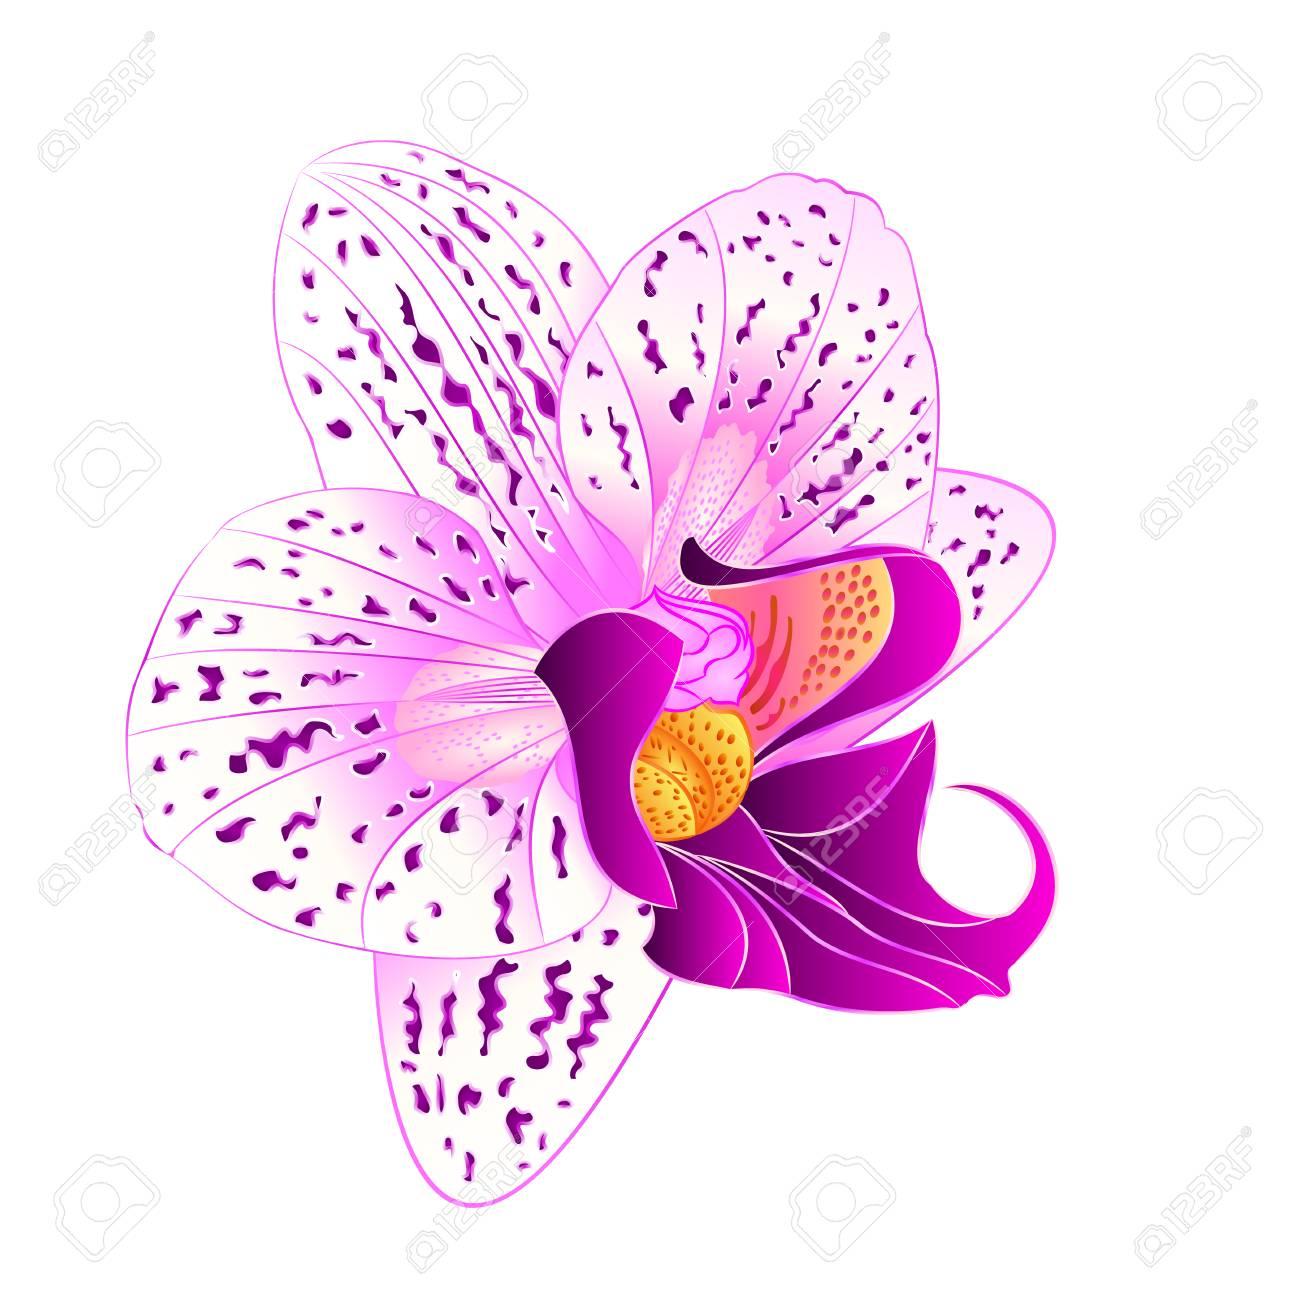 Purple And White Orchid Phalaenopsis Beautiful Flower Closeup